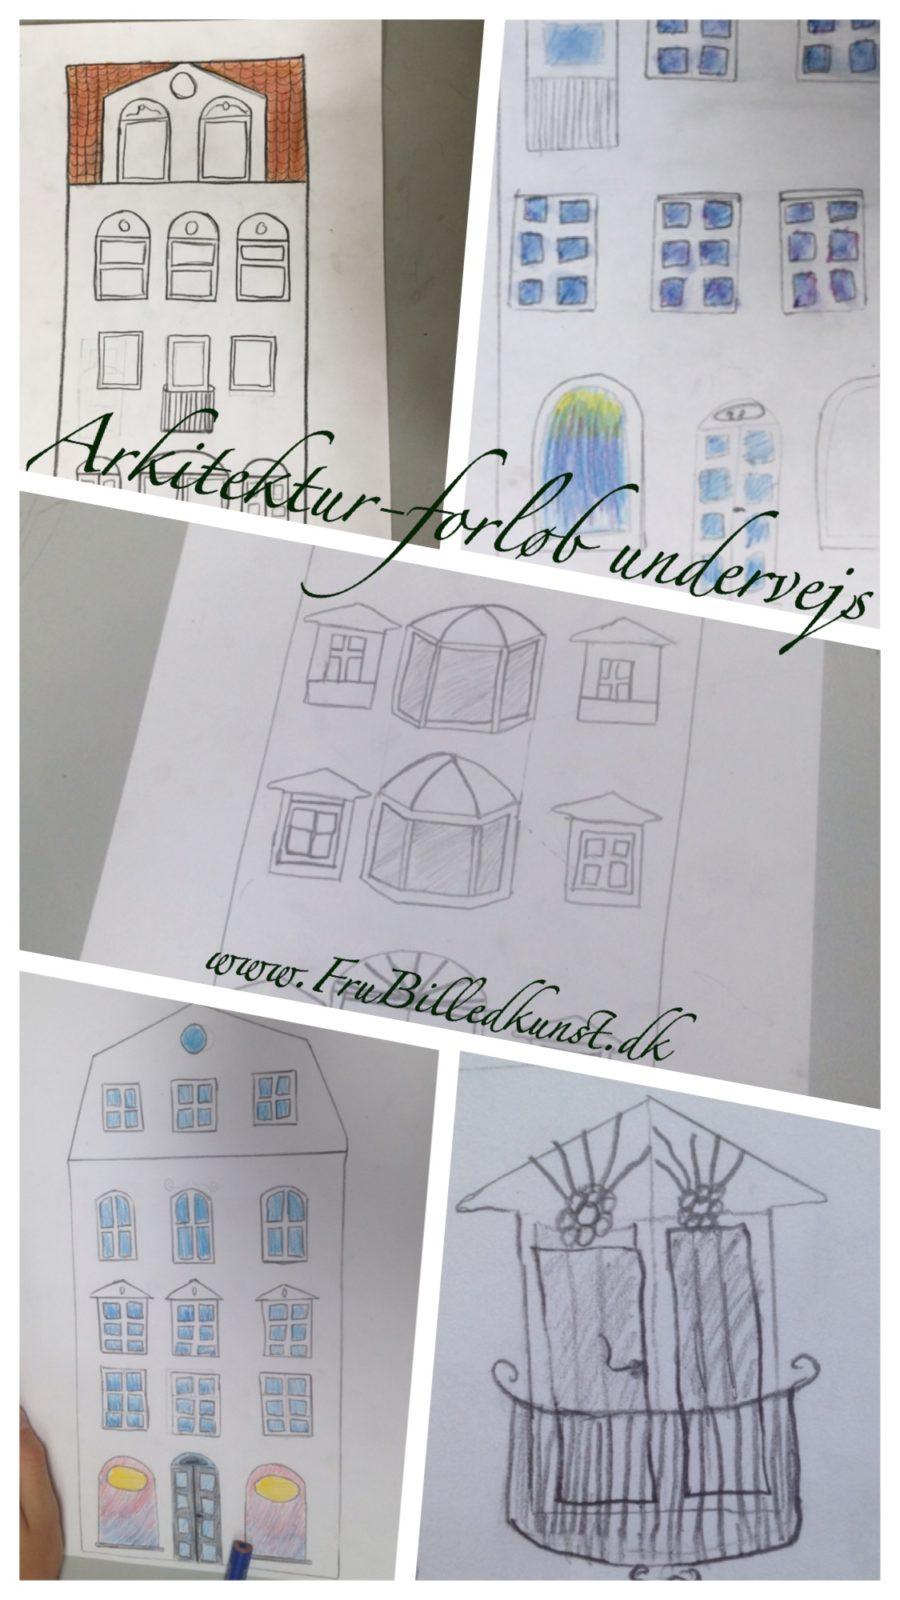 arkitektur i billedkunst 3klasse - www.FruBilledkunst.dk